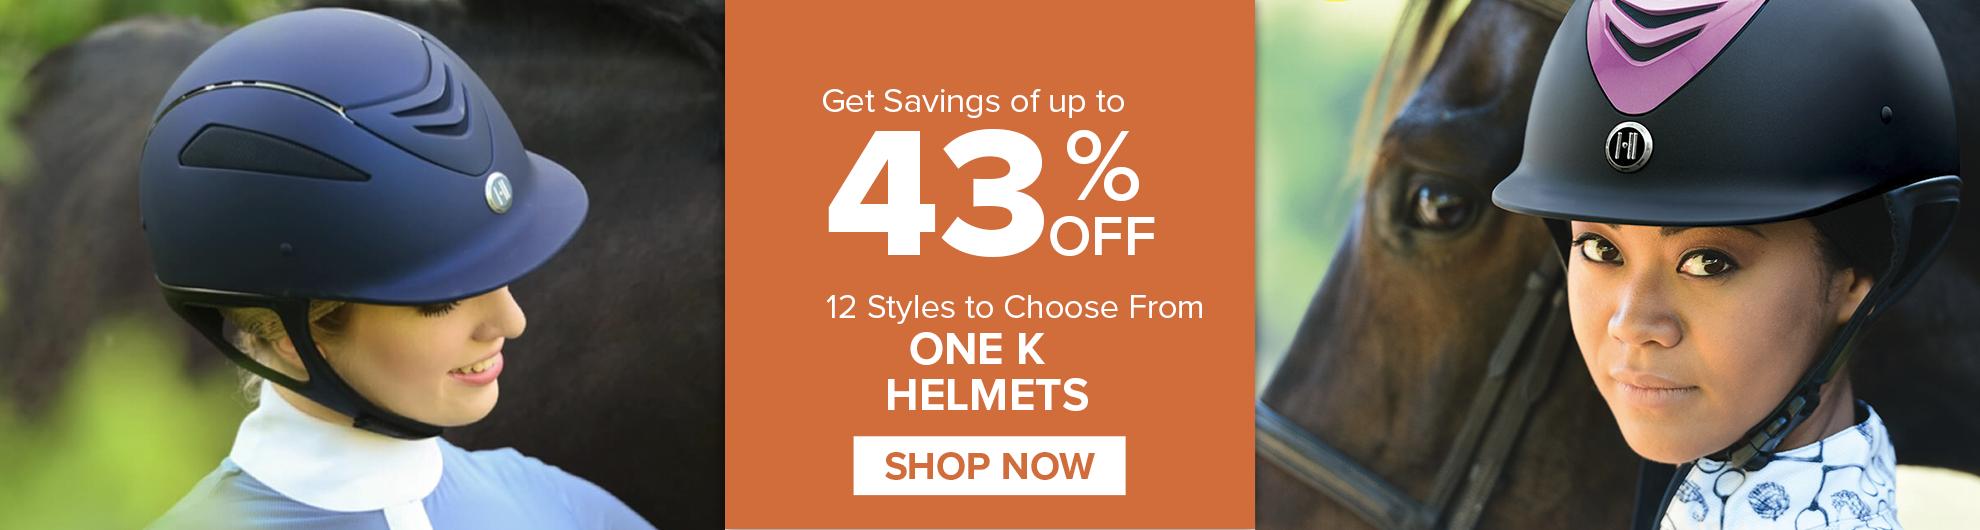 One K Helmets on Sale